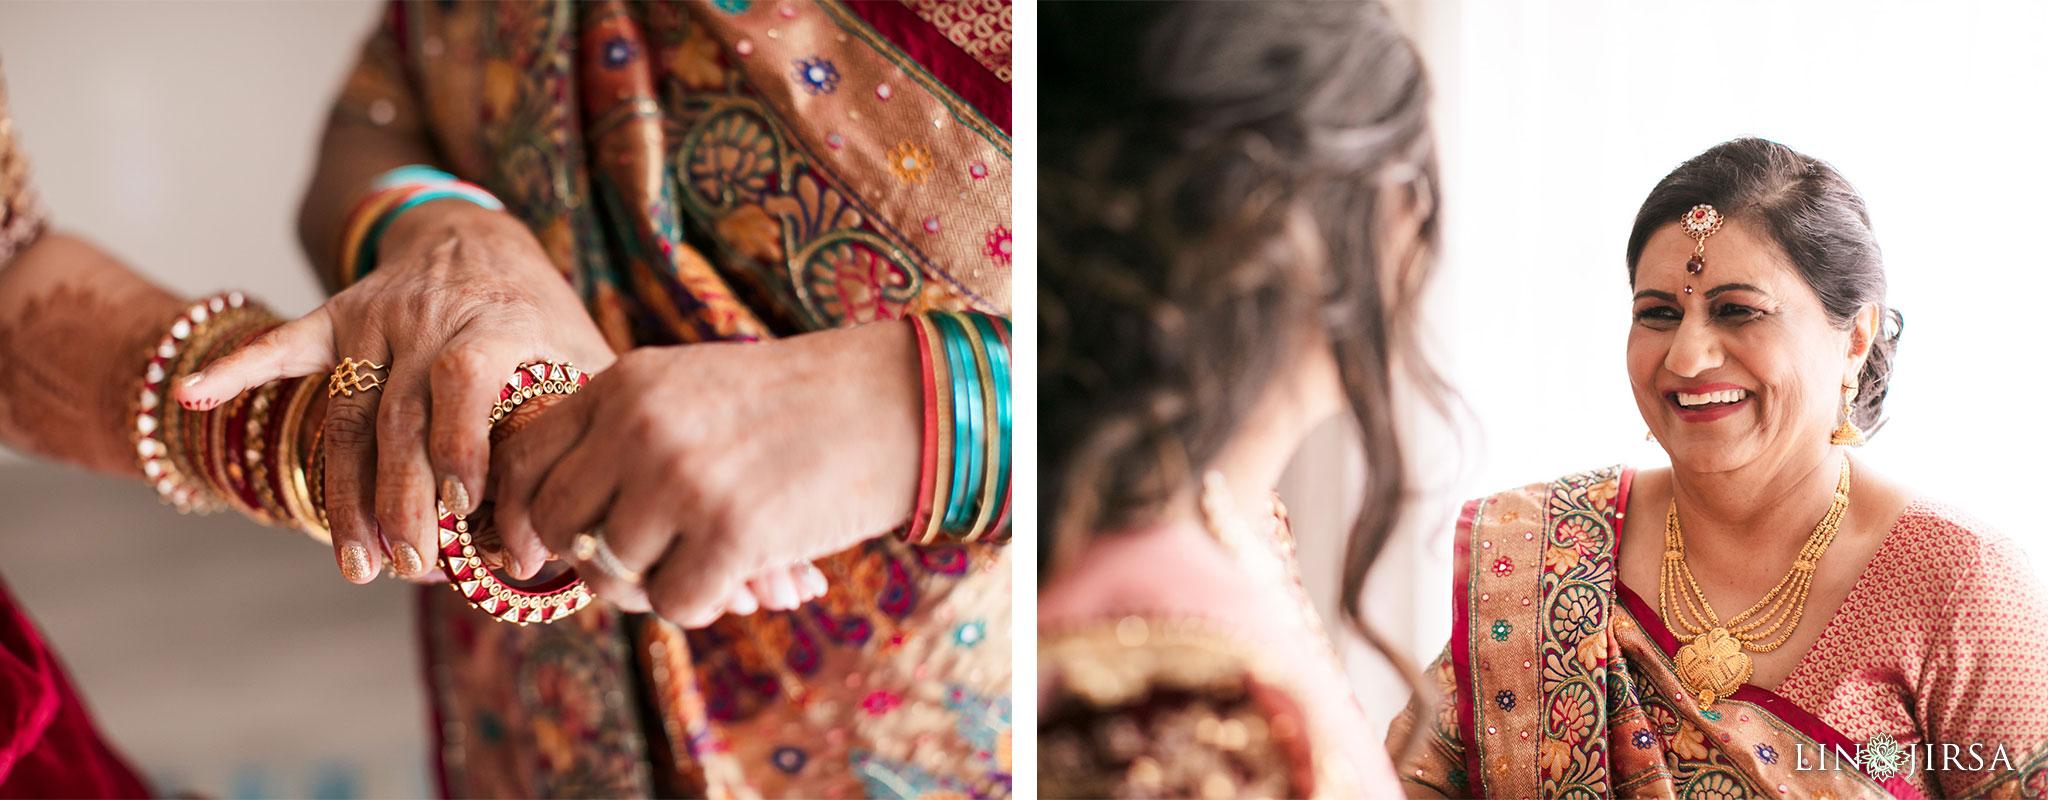 02 sheraton carlsbad resort indian wedding photography